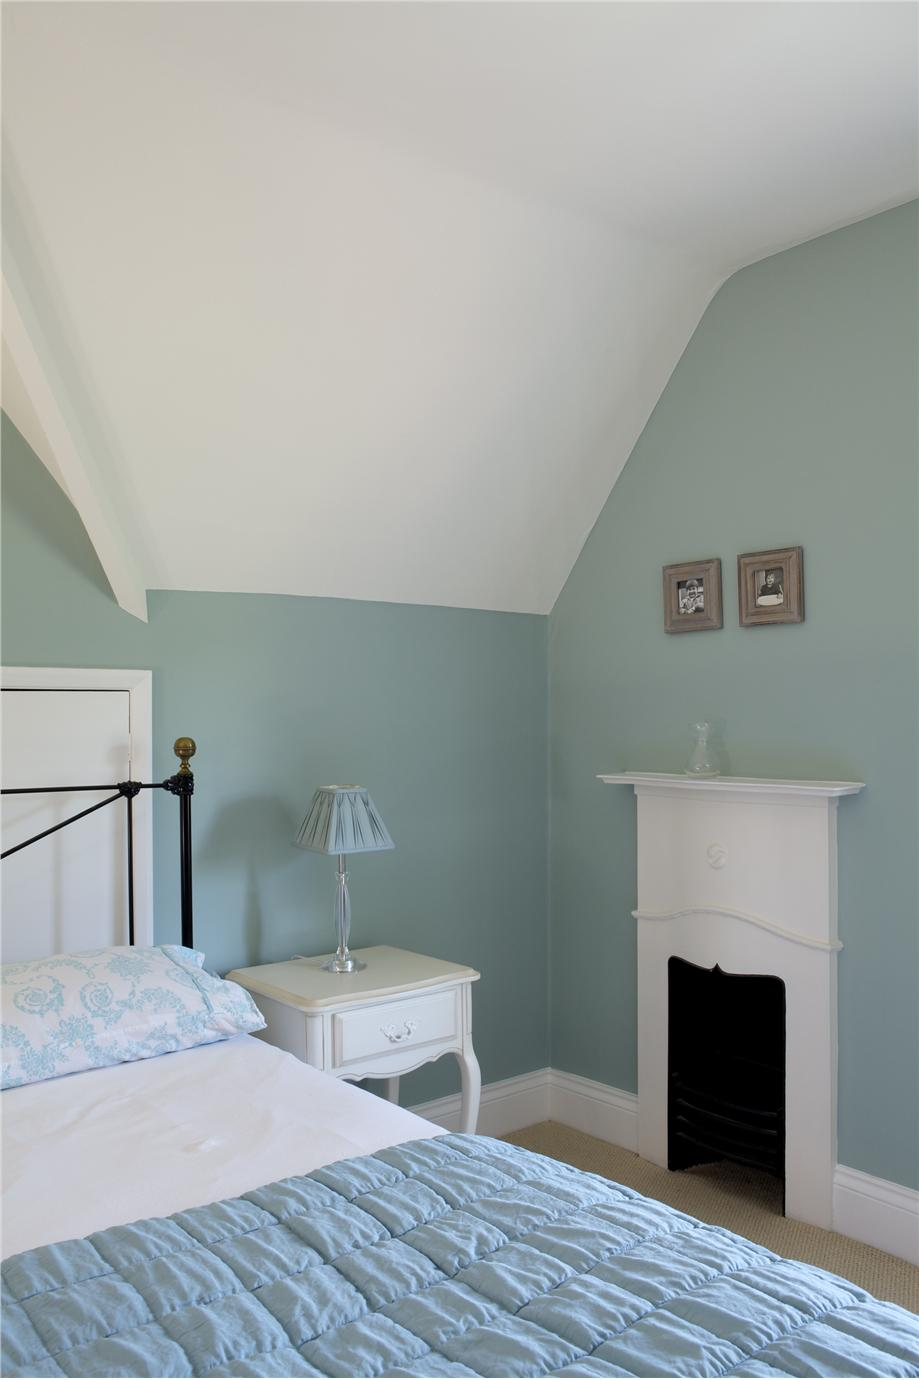 farrow ball green blue 84 eparket. Black Bedroom Furniture Sets. Home Design Ideas